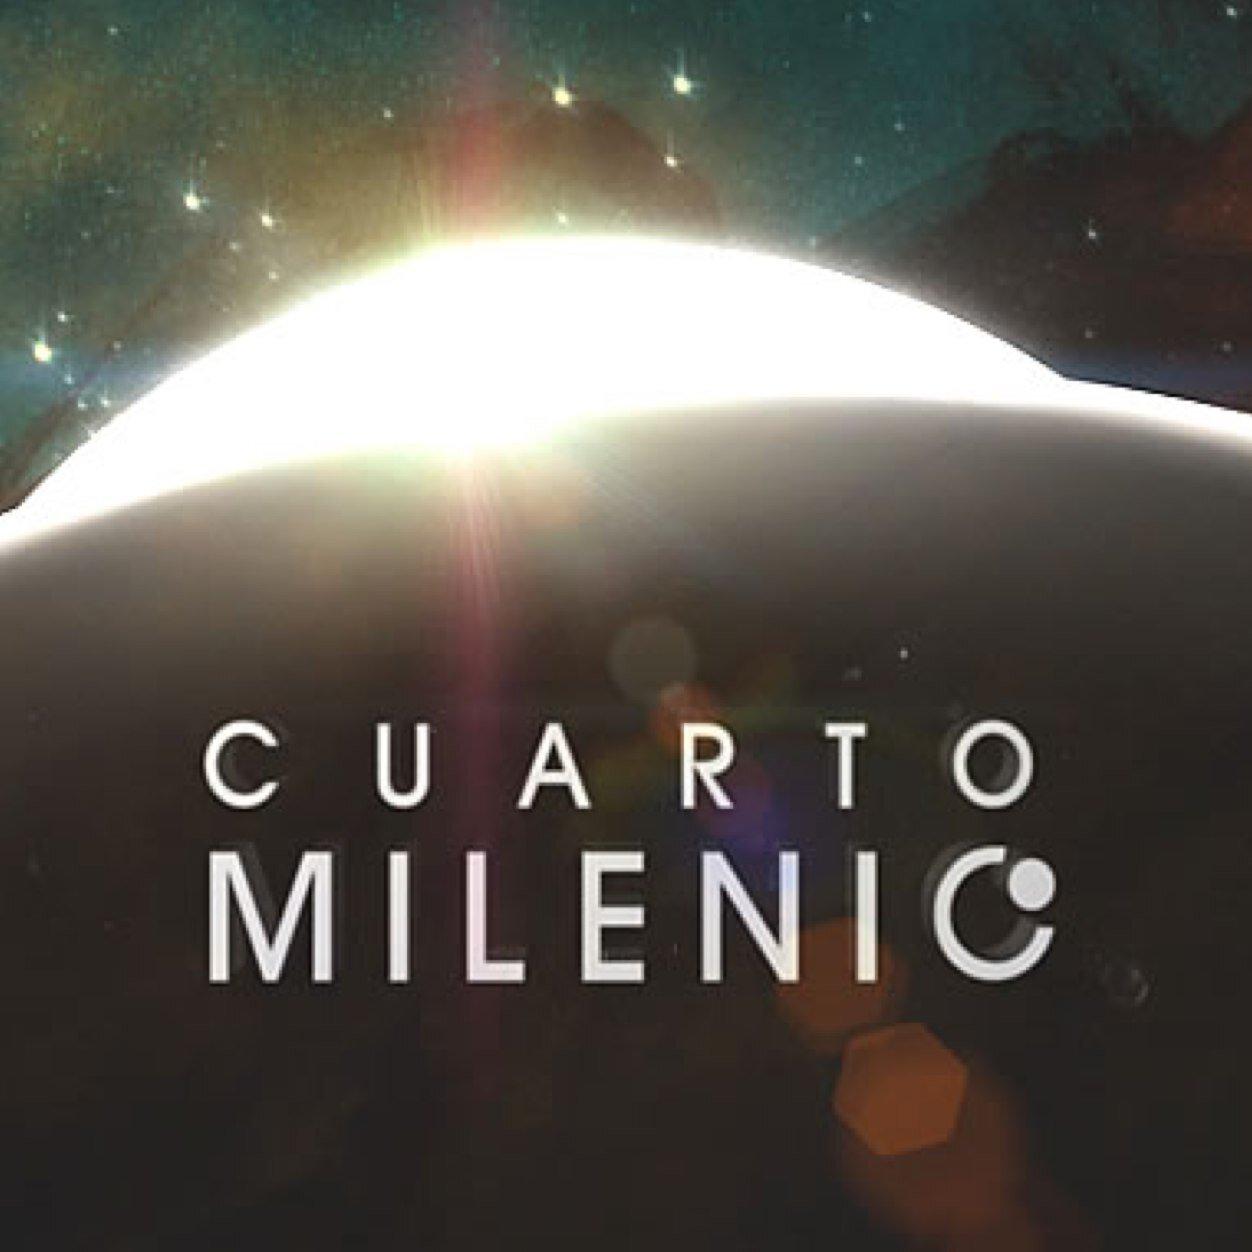 Cuarto milenio cuartotrienio twitter for Twitter cuarto milenio